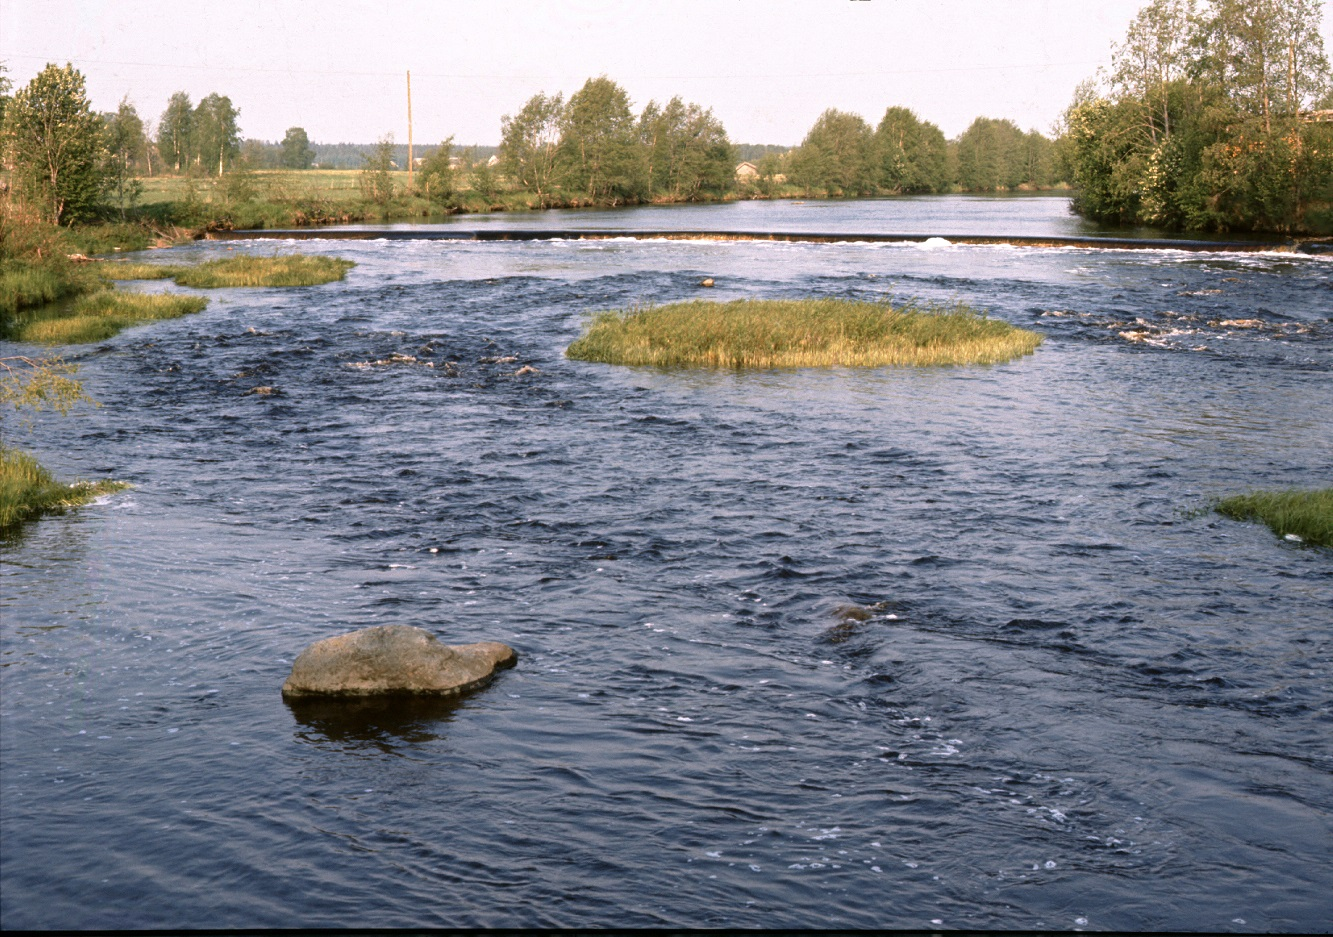 Dammen i Klemetsforsen fotograferad 1972 från Klemetsbroen.